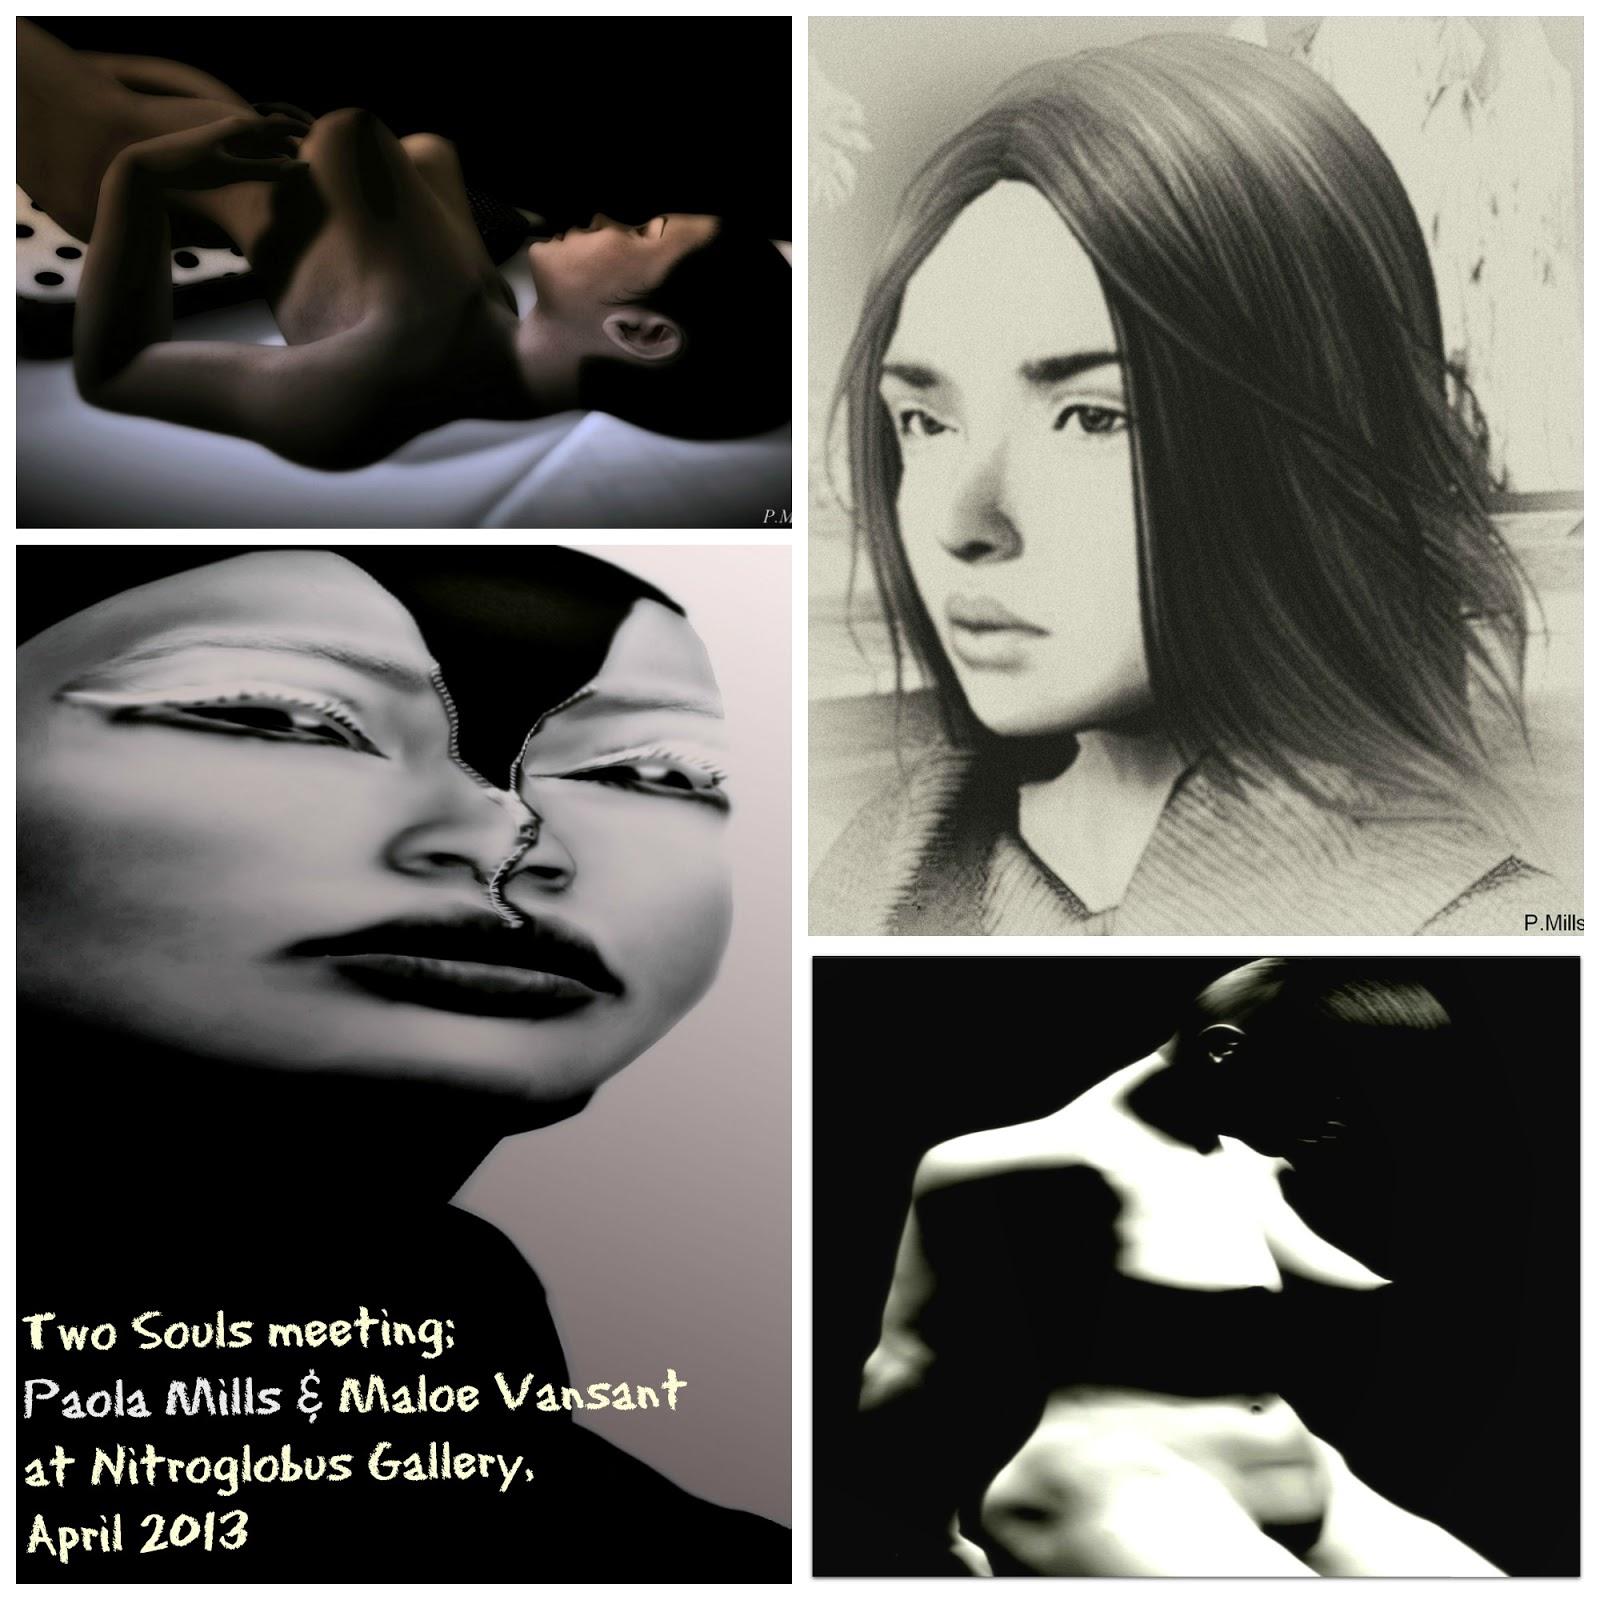 http://1.bp.blogspot.com/-sxWTp-cfnu8/UVTjMQD4ghI/AAAAAAAAJT4/ykHb3YqppBA/s1600/two+souls+meeting+poster.jpg